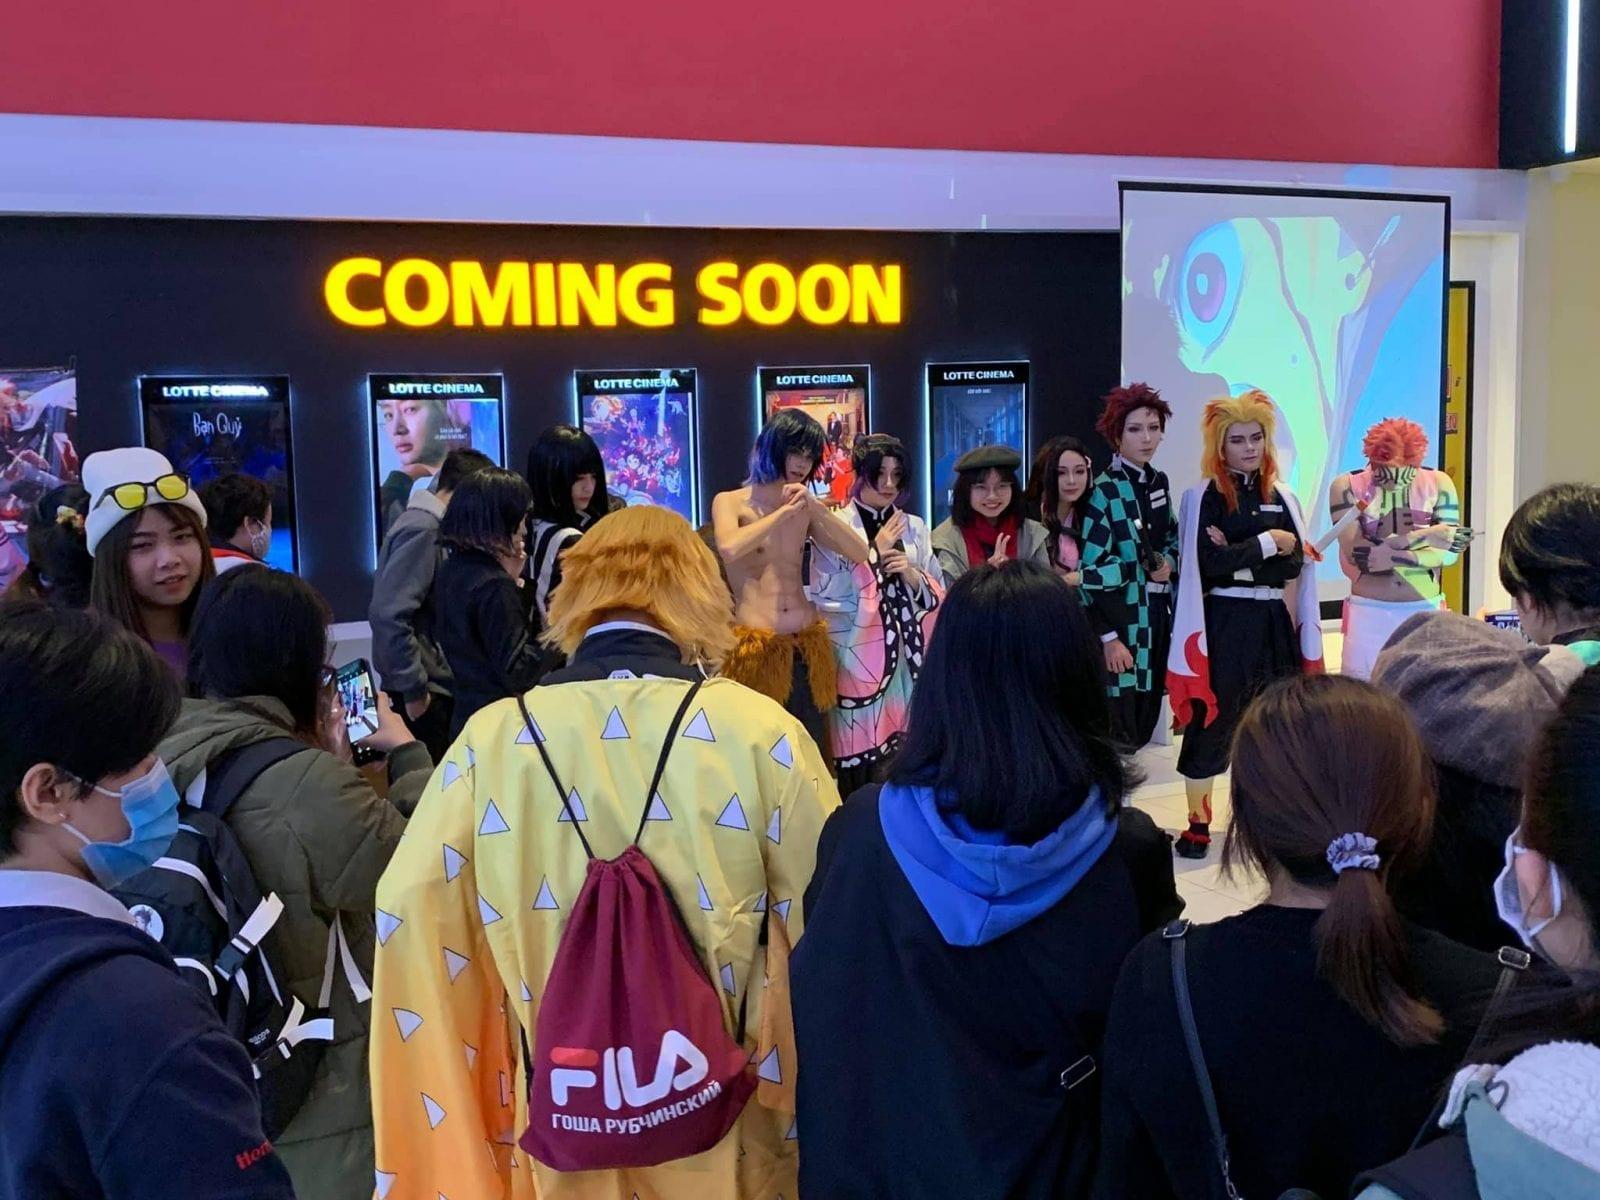 Image of anime fans at Lotte Cinema at Landmark 72 in Hanoi, Vietnam